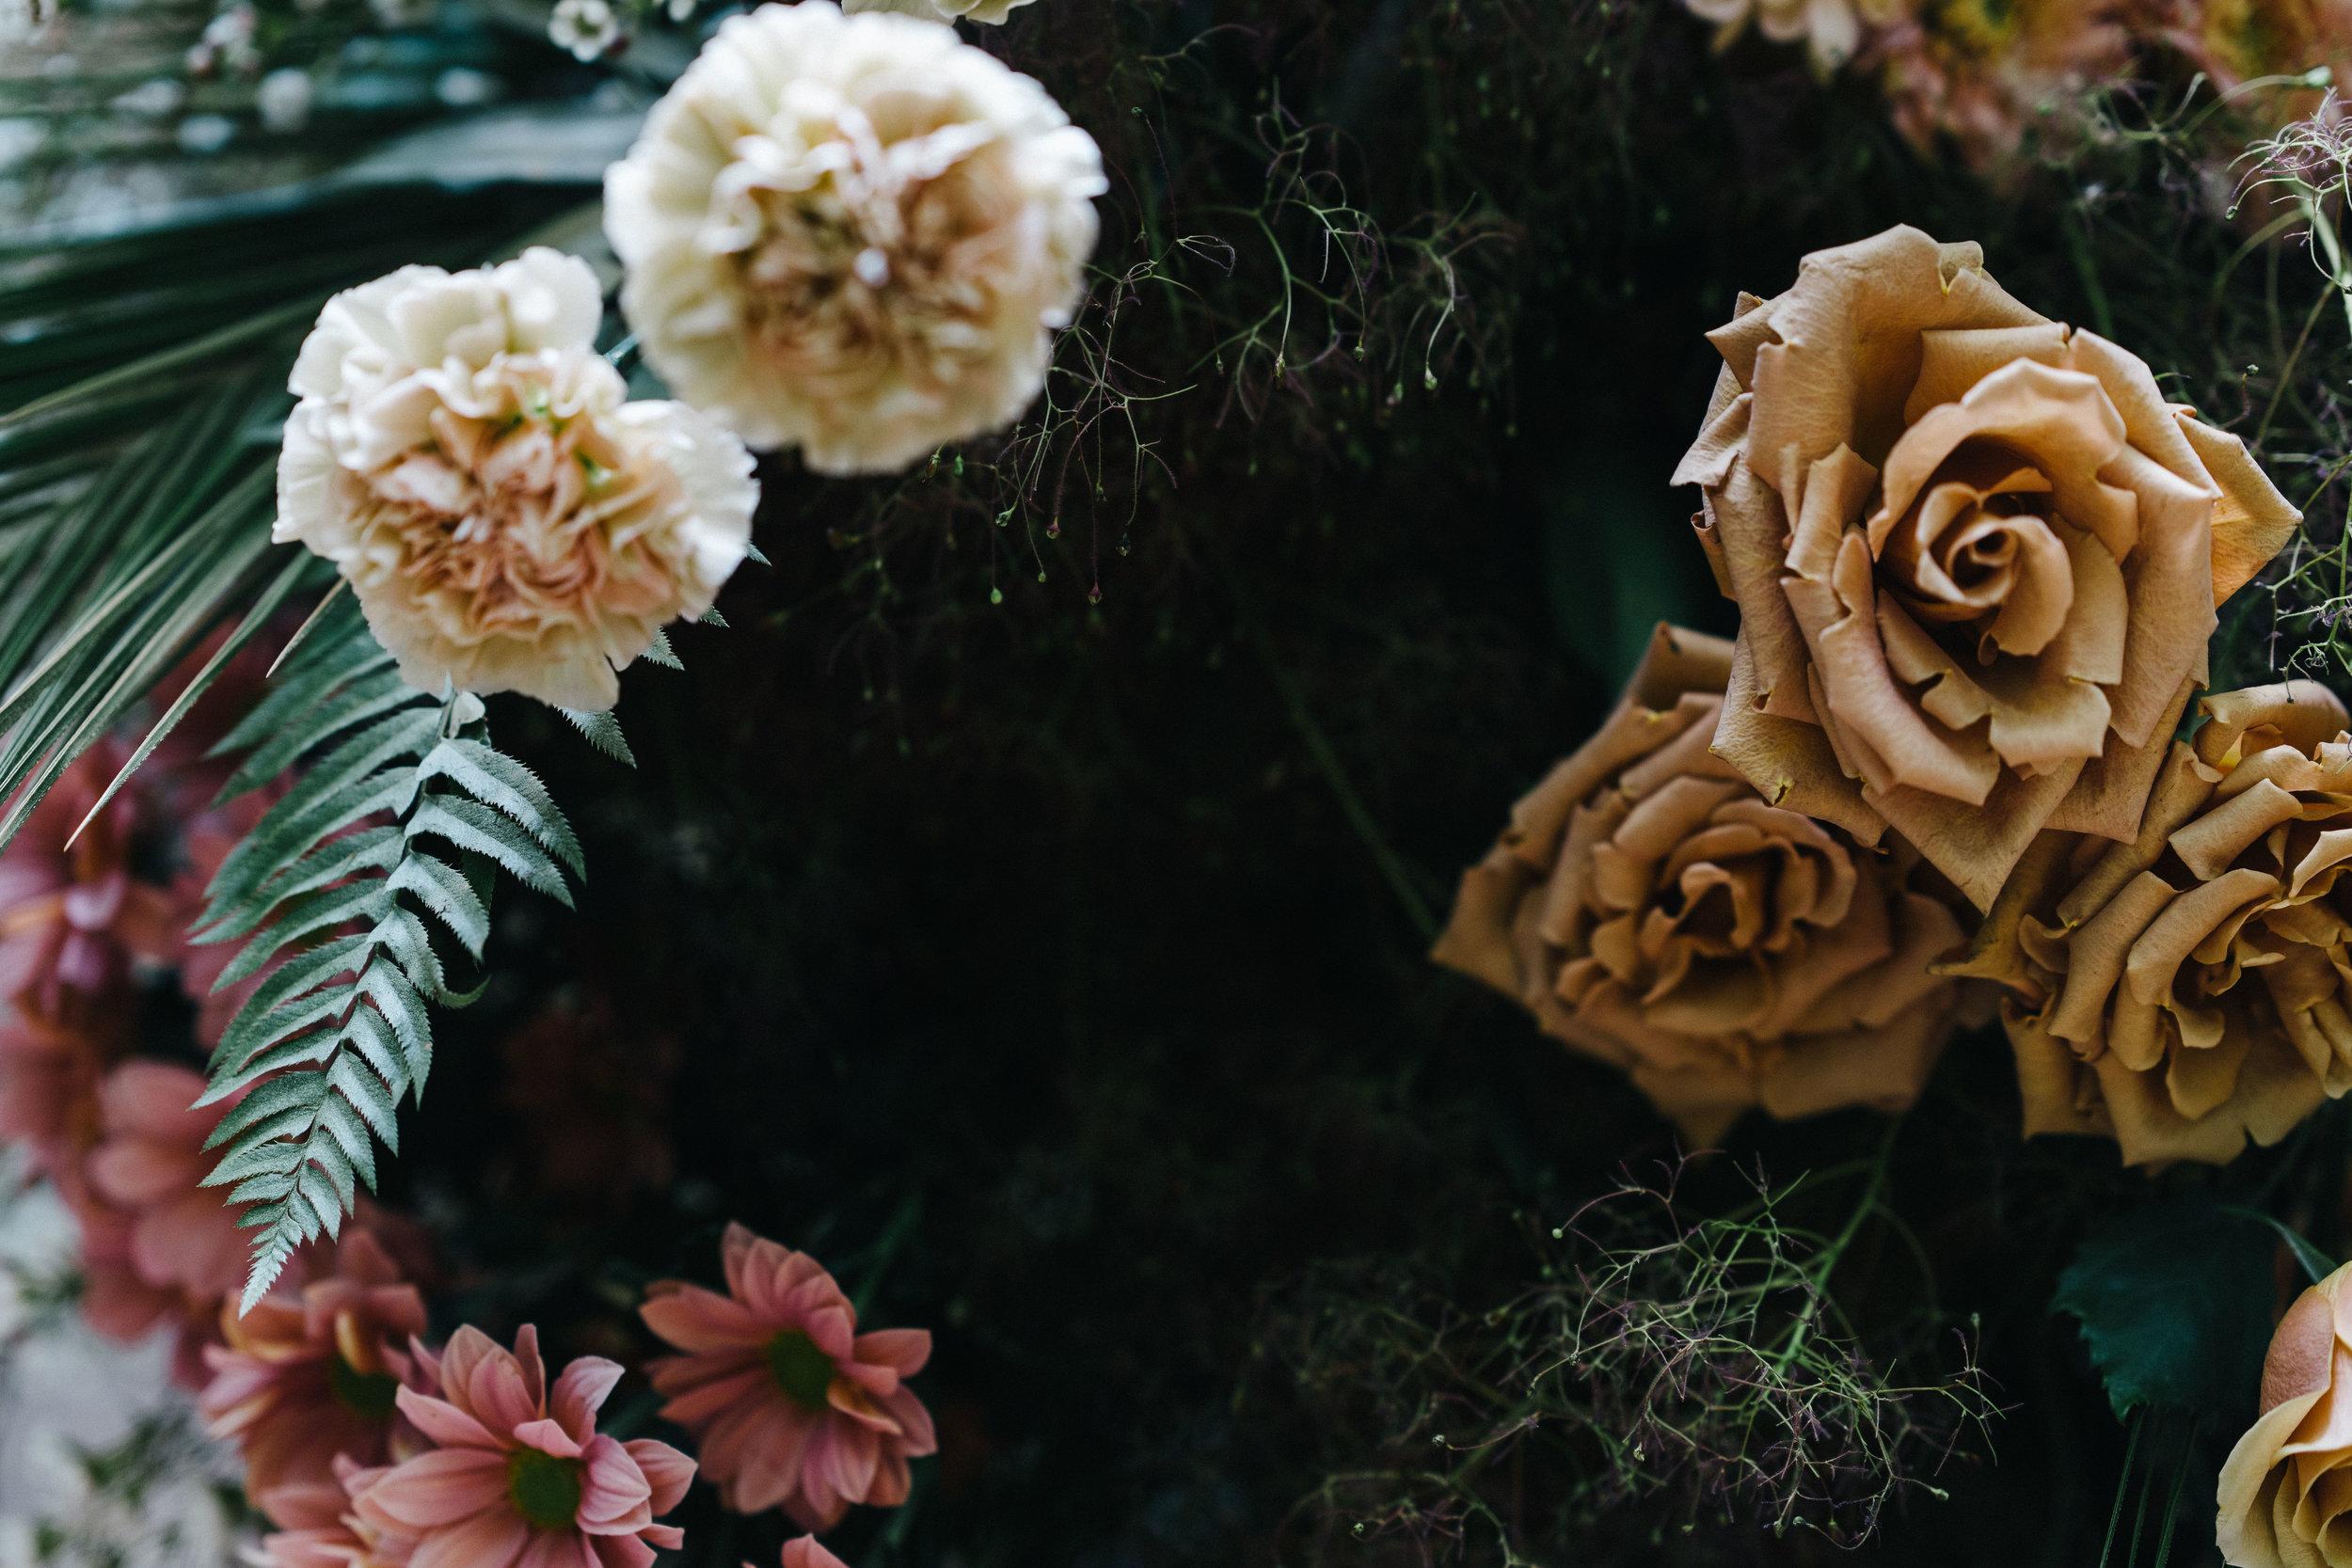 Zach&Grace_GreenAcres_2019_Stills (21 of 38).jpg